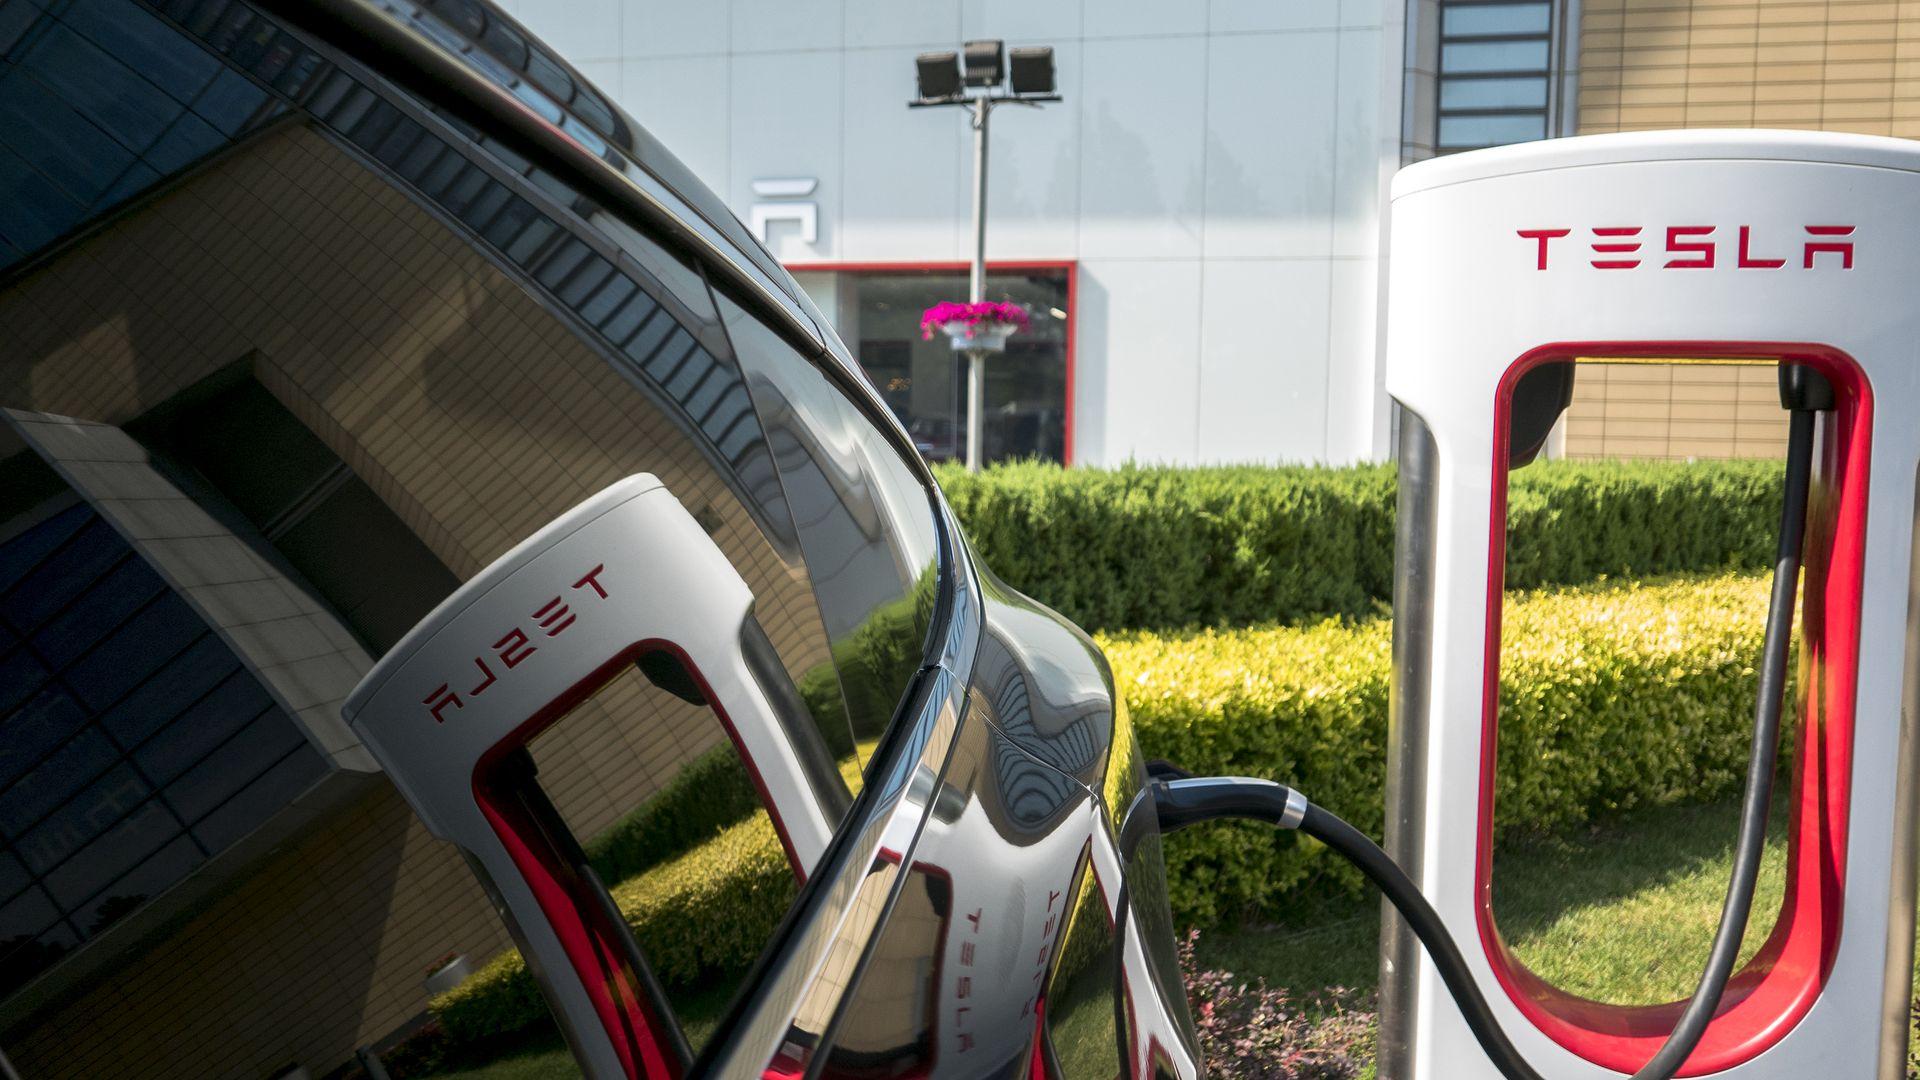 Tesla car charging